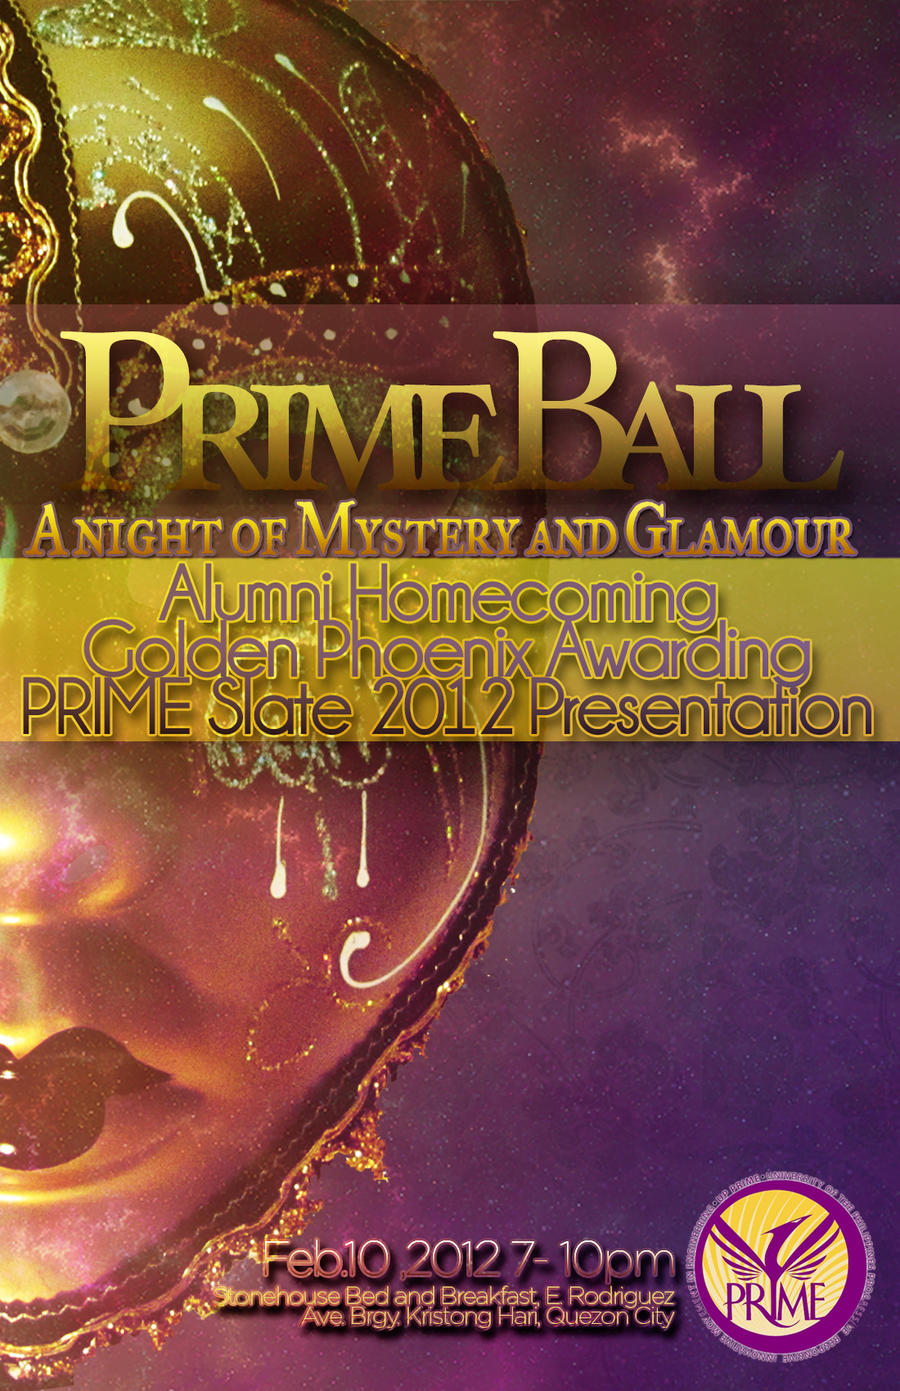 [POSTER] prime ball by pinefir